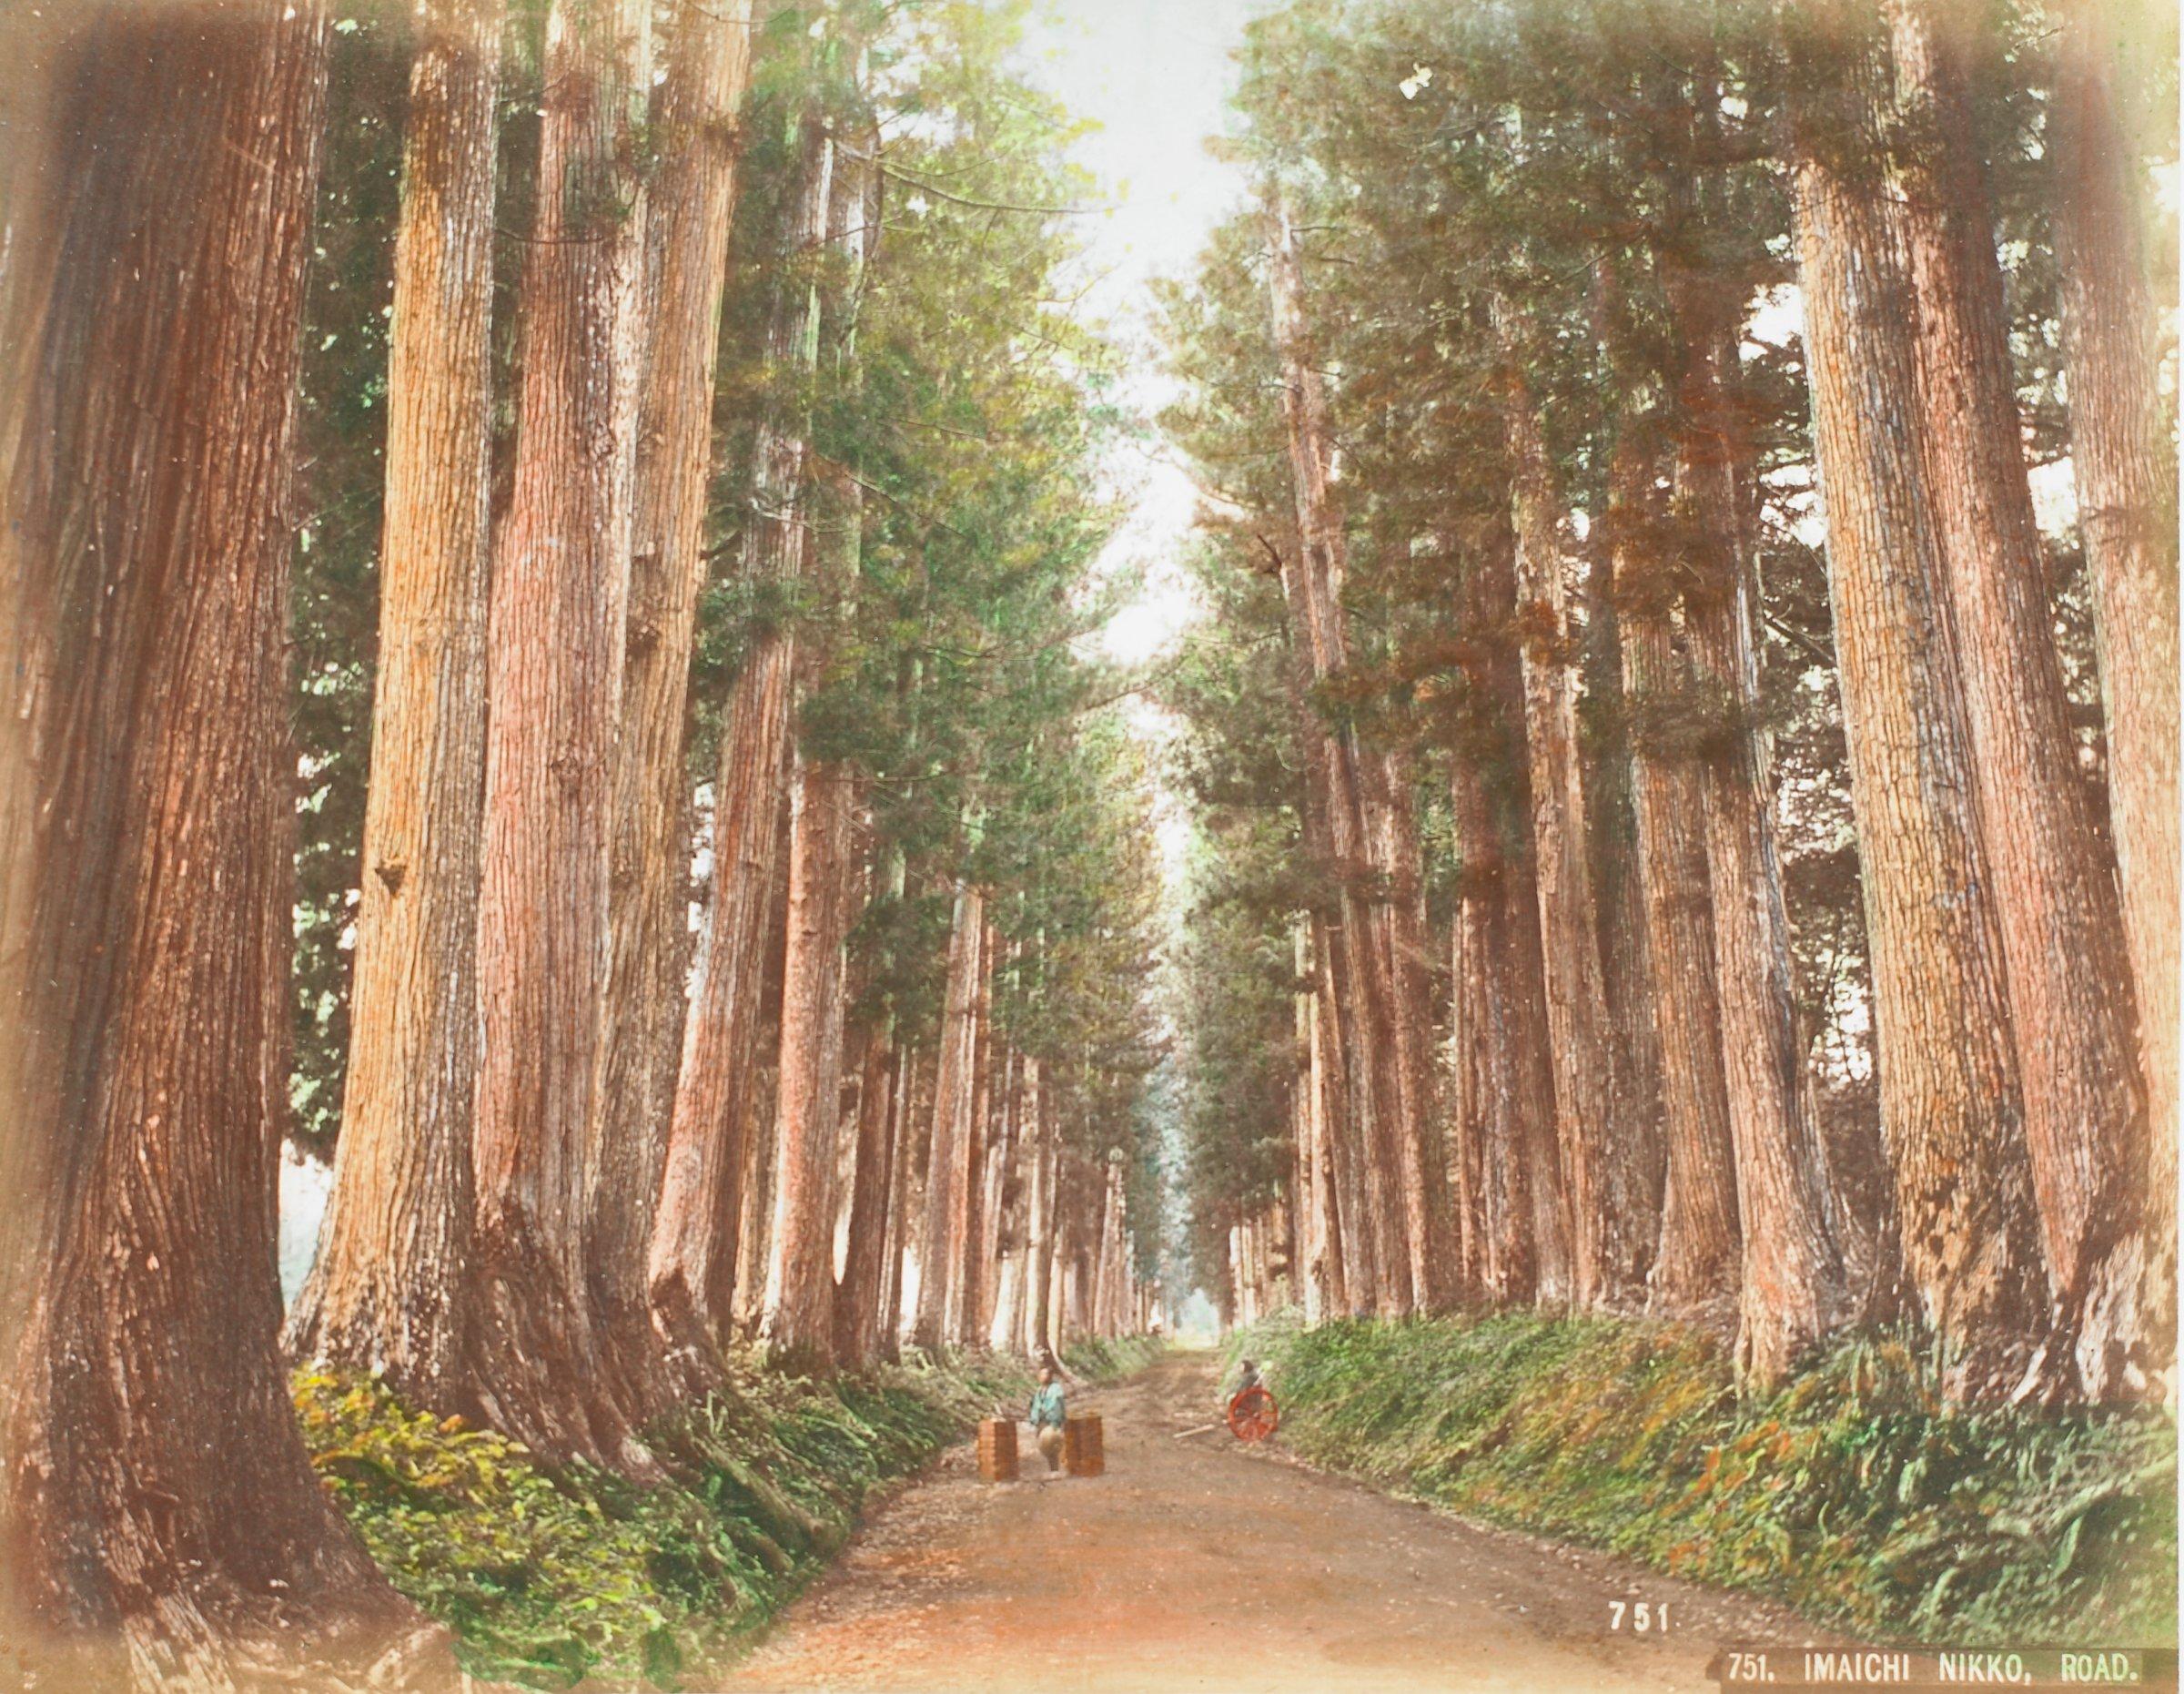 Imaichi Nikko, Road (.40, recto); Sacred Bridge, Nikko (.41, verso), Attributed to Kusakabe Kimbei, hand-colored albumen prints mounted to album page